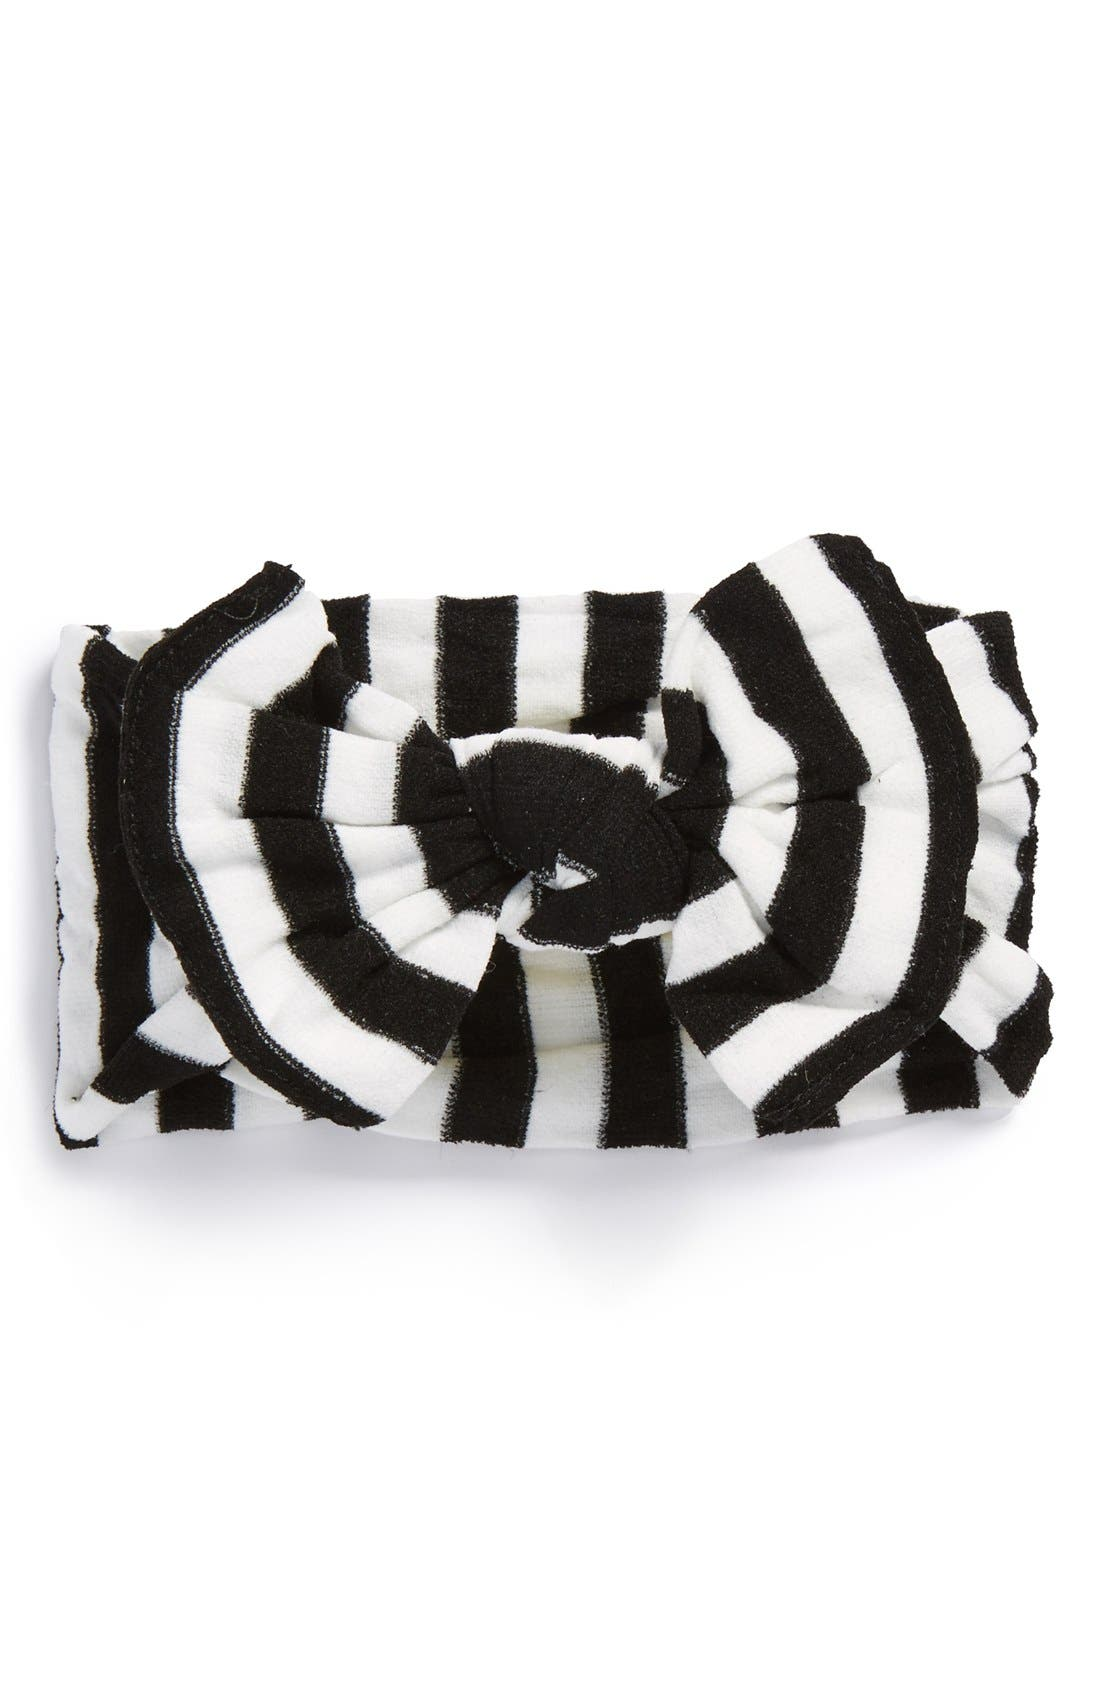 BABY BLING Stripe Headband, Main, color, BLACK